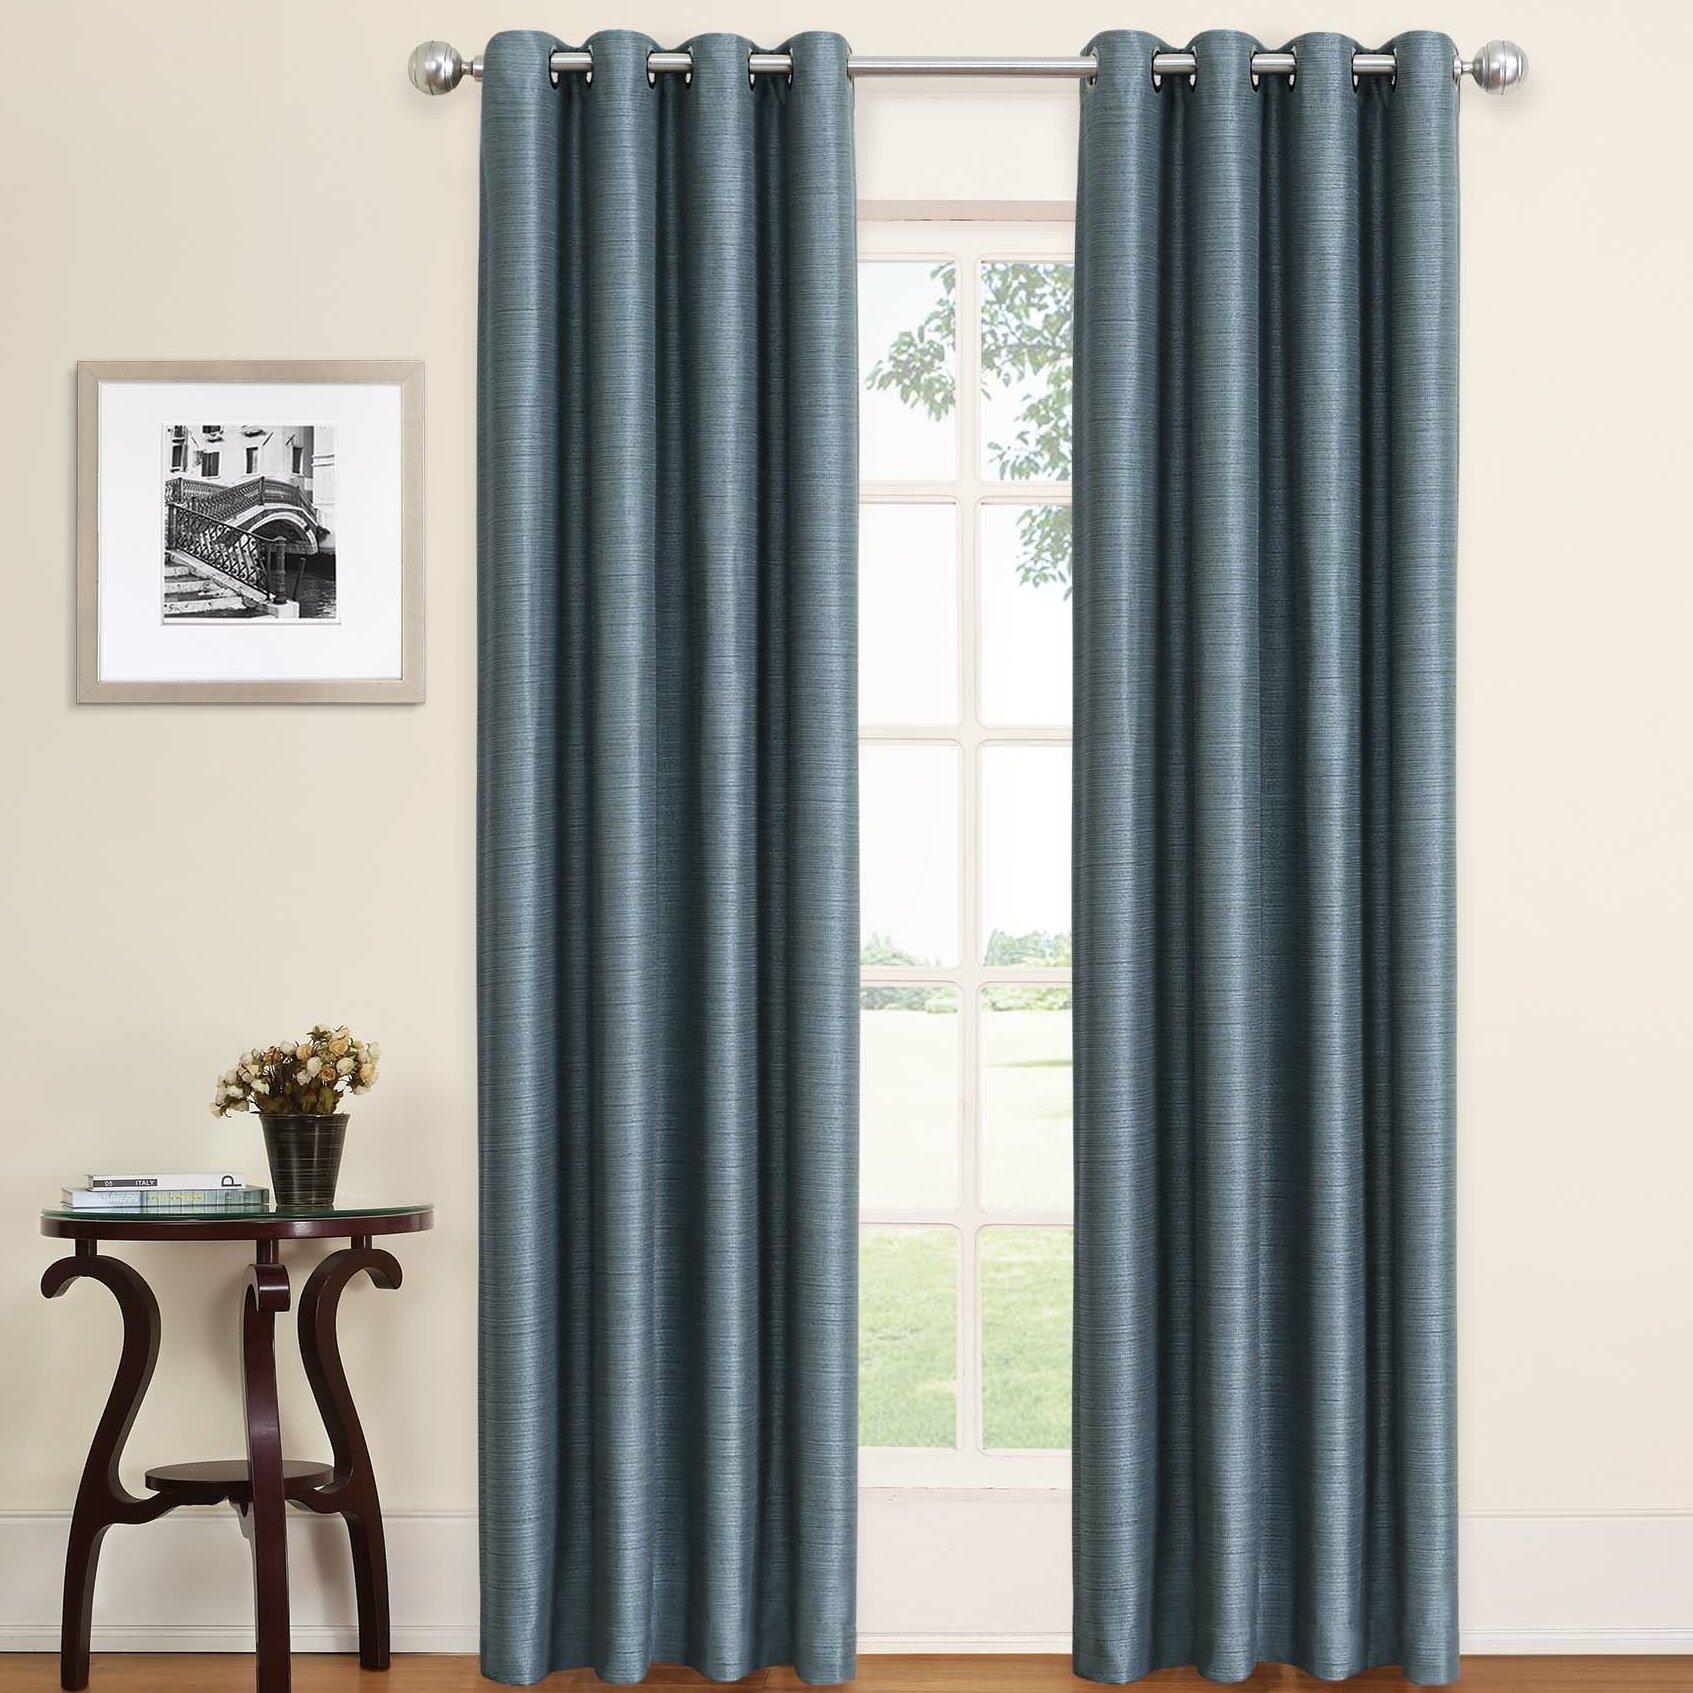 curtains drapes 63 83 length curtains drapes ec